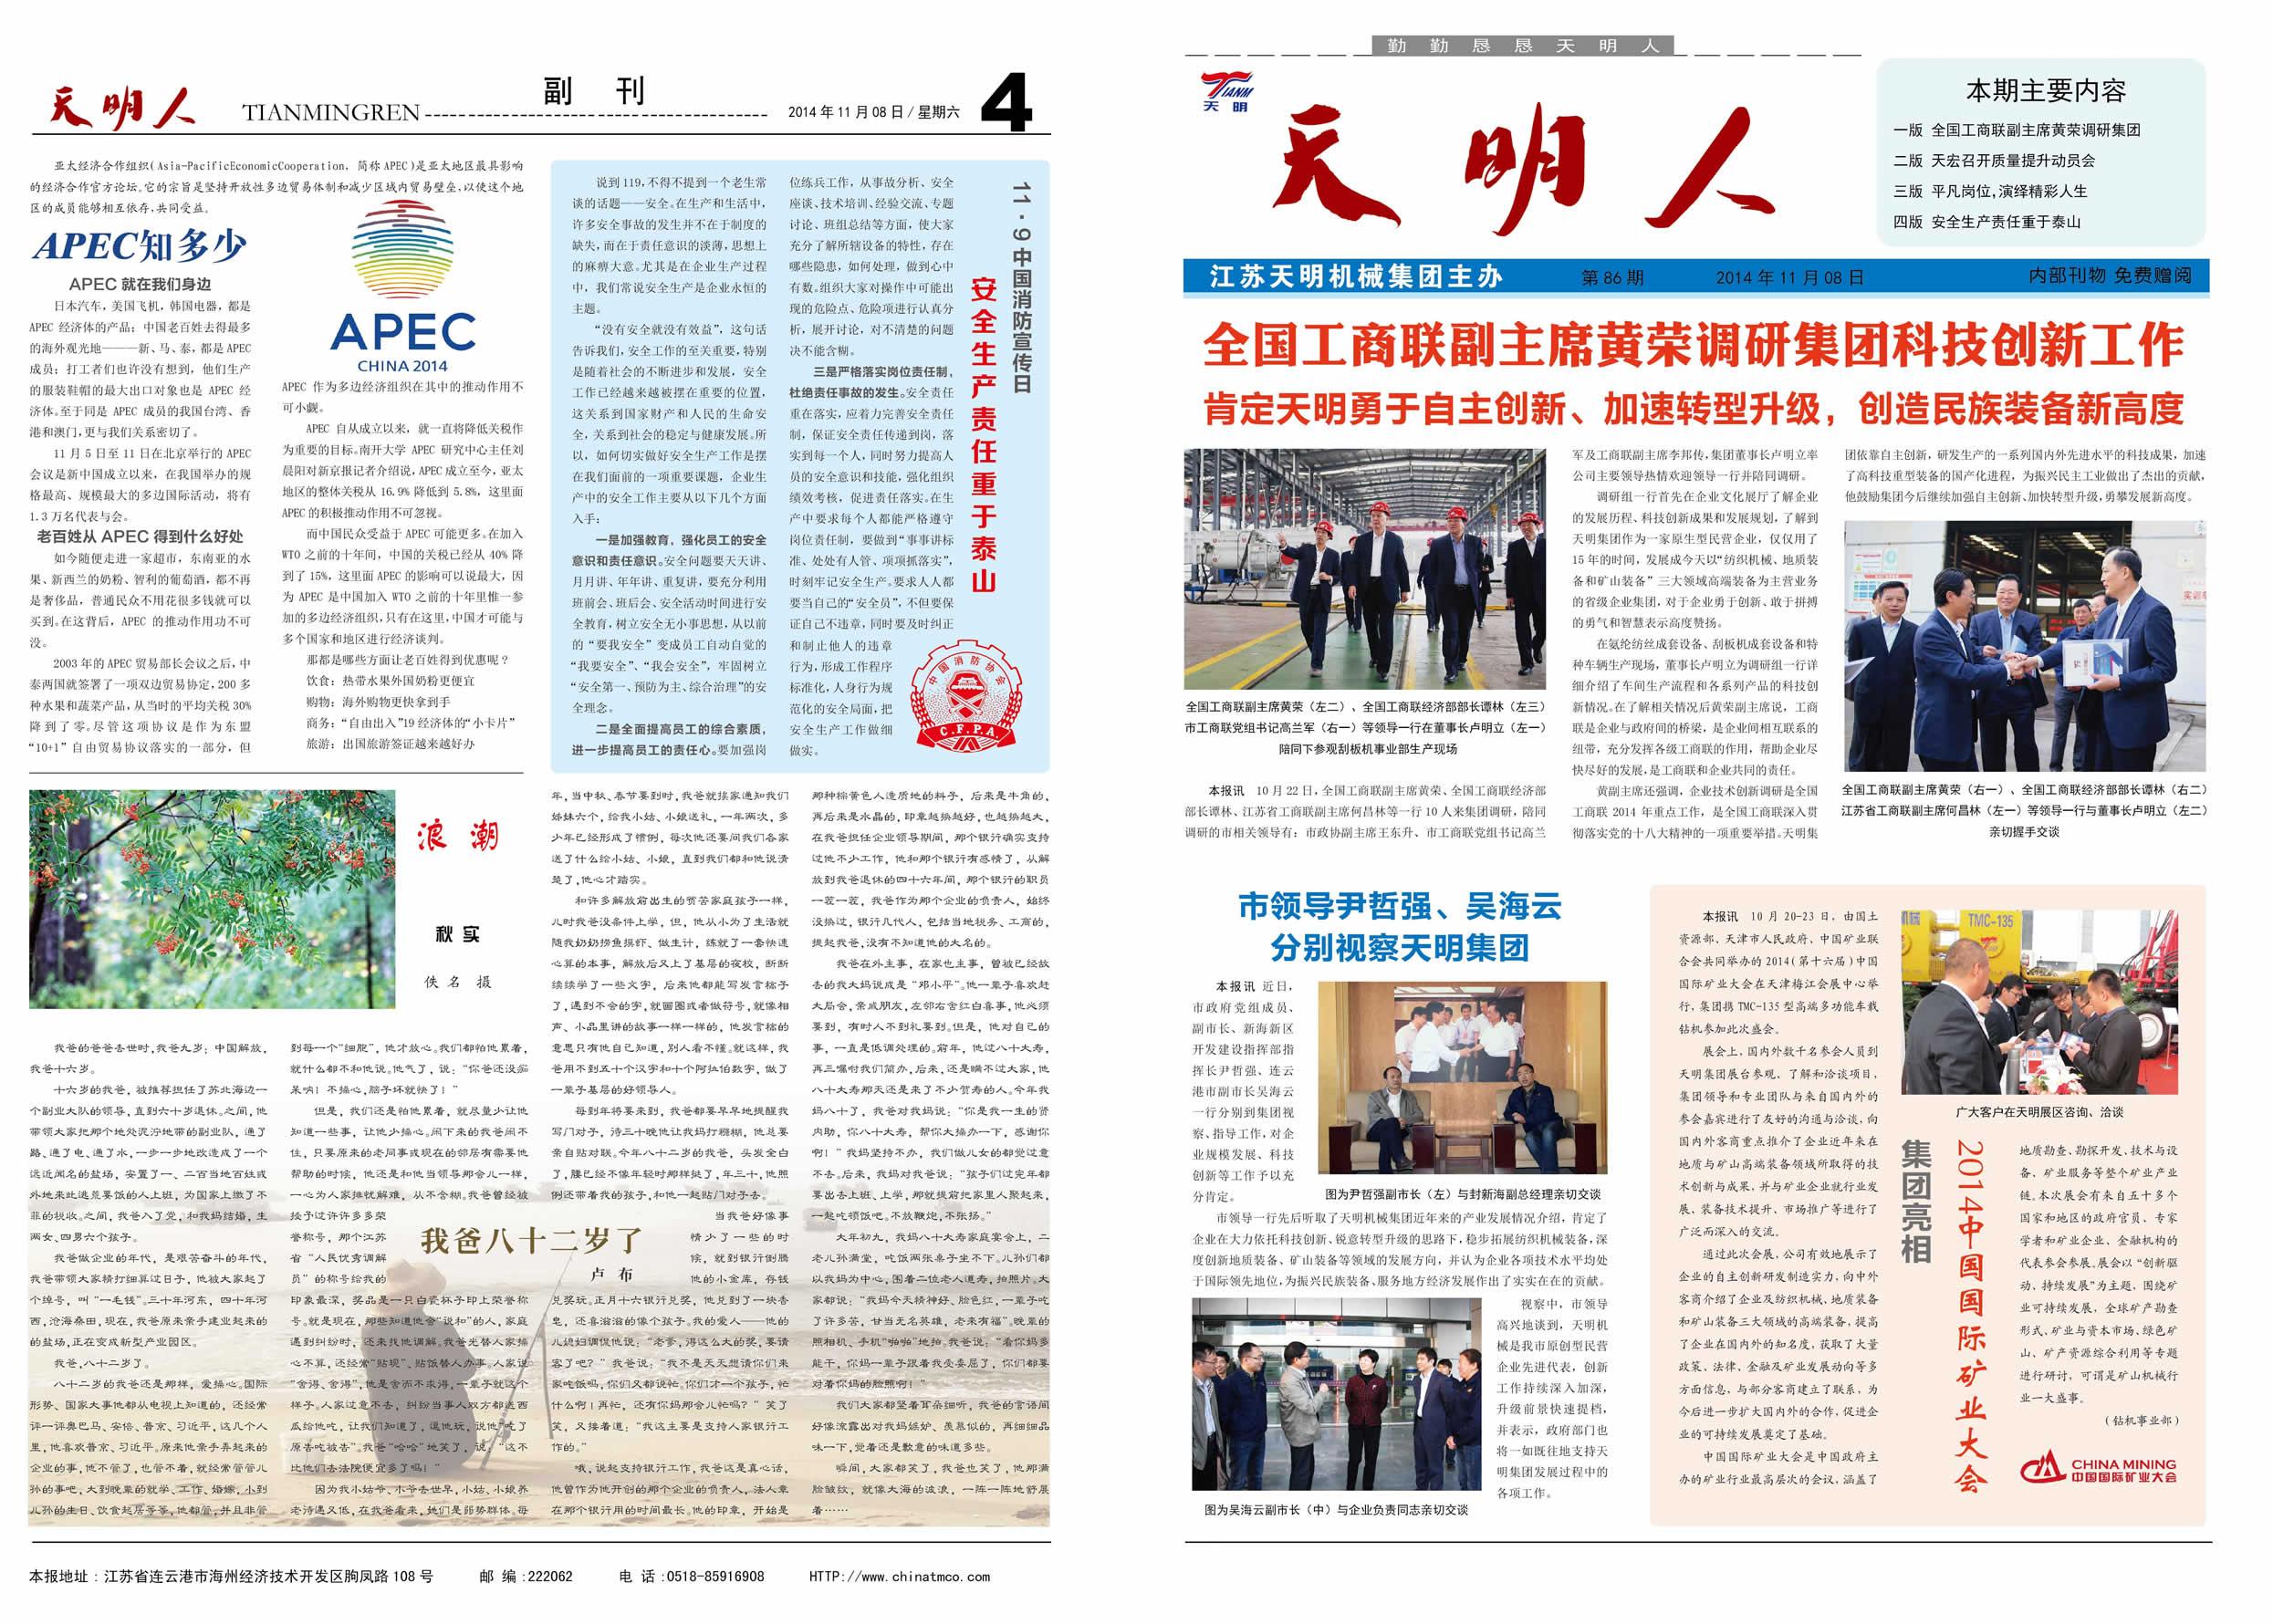 hg711皇冠国际_hg88皇冠国际平台_hg皇冠国际vip首页人2014第11期(总第86期)1、4版